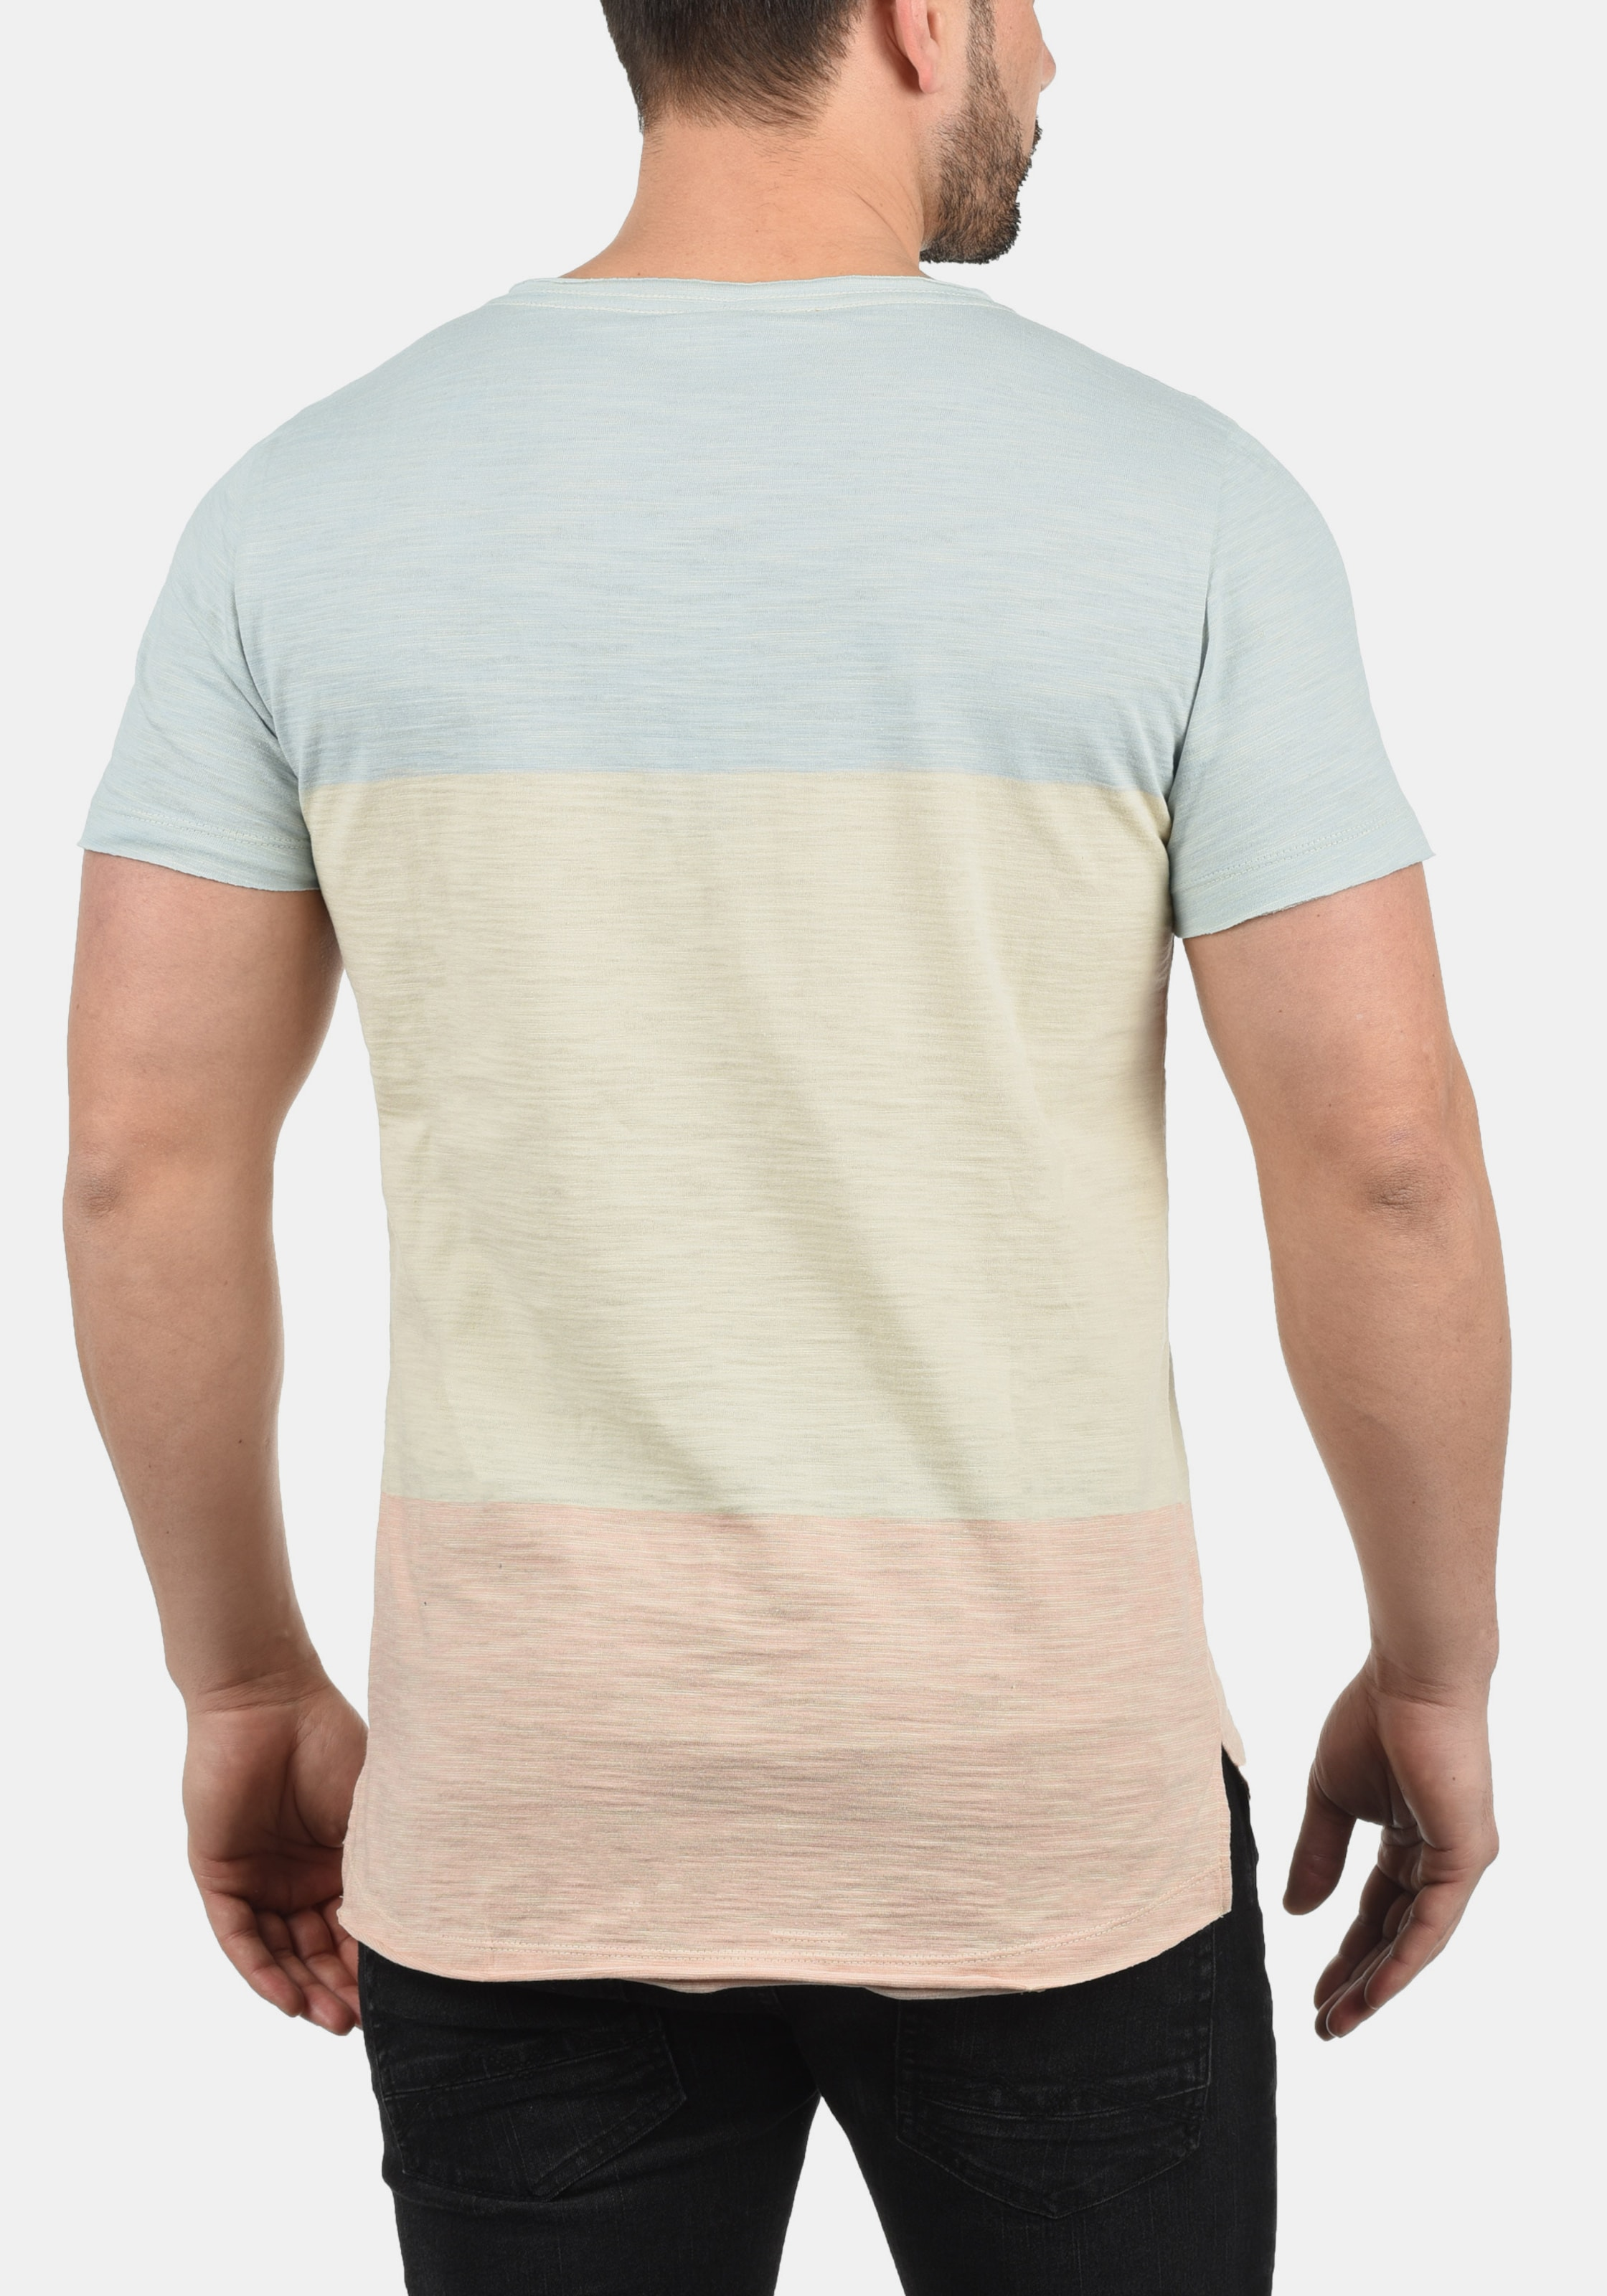 Blau shirt T In Blend 'johannes' UzVGSMLpq